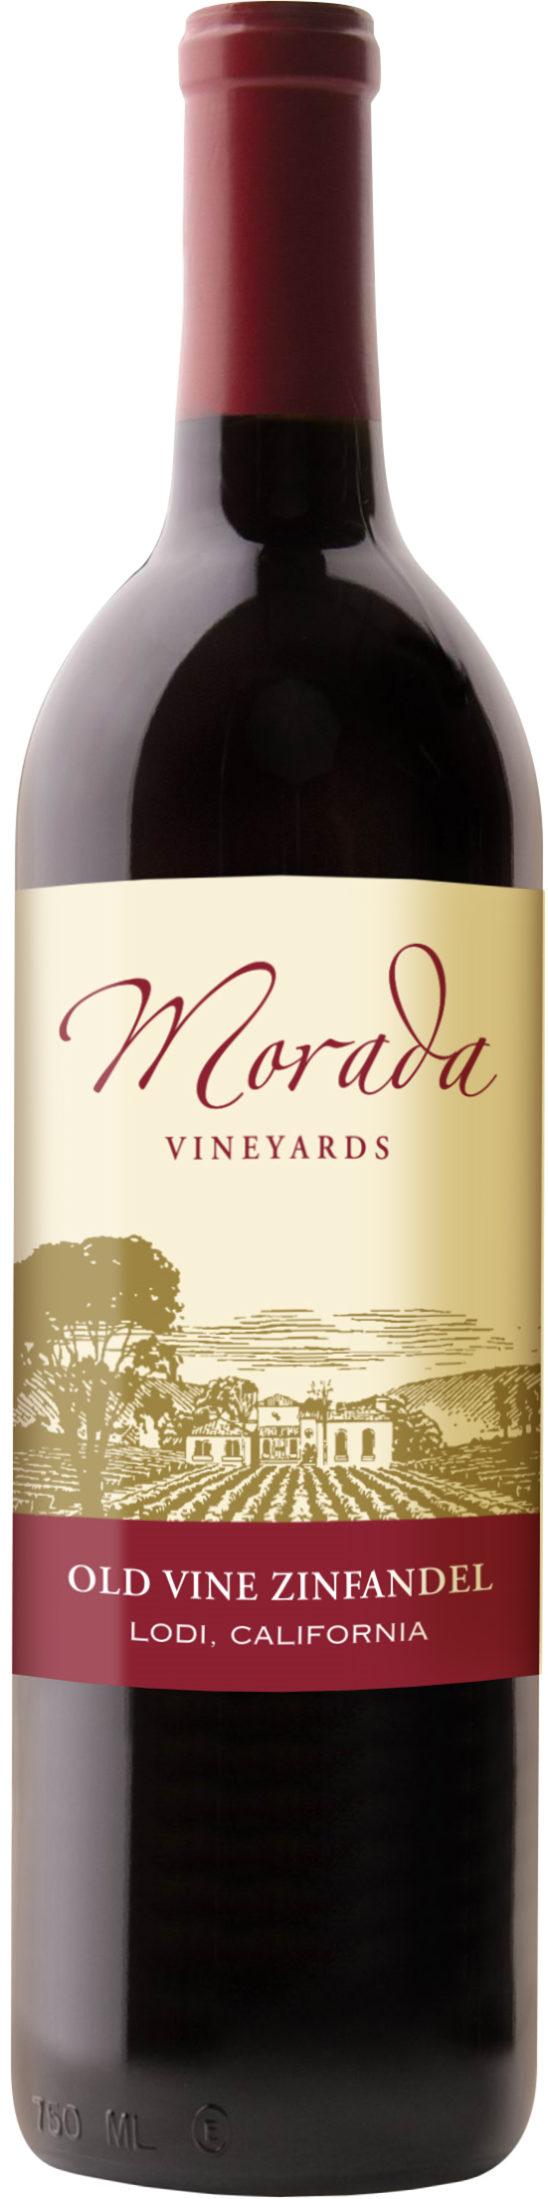 Morada Vineyards Old Vine Zinfandel